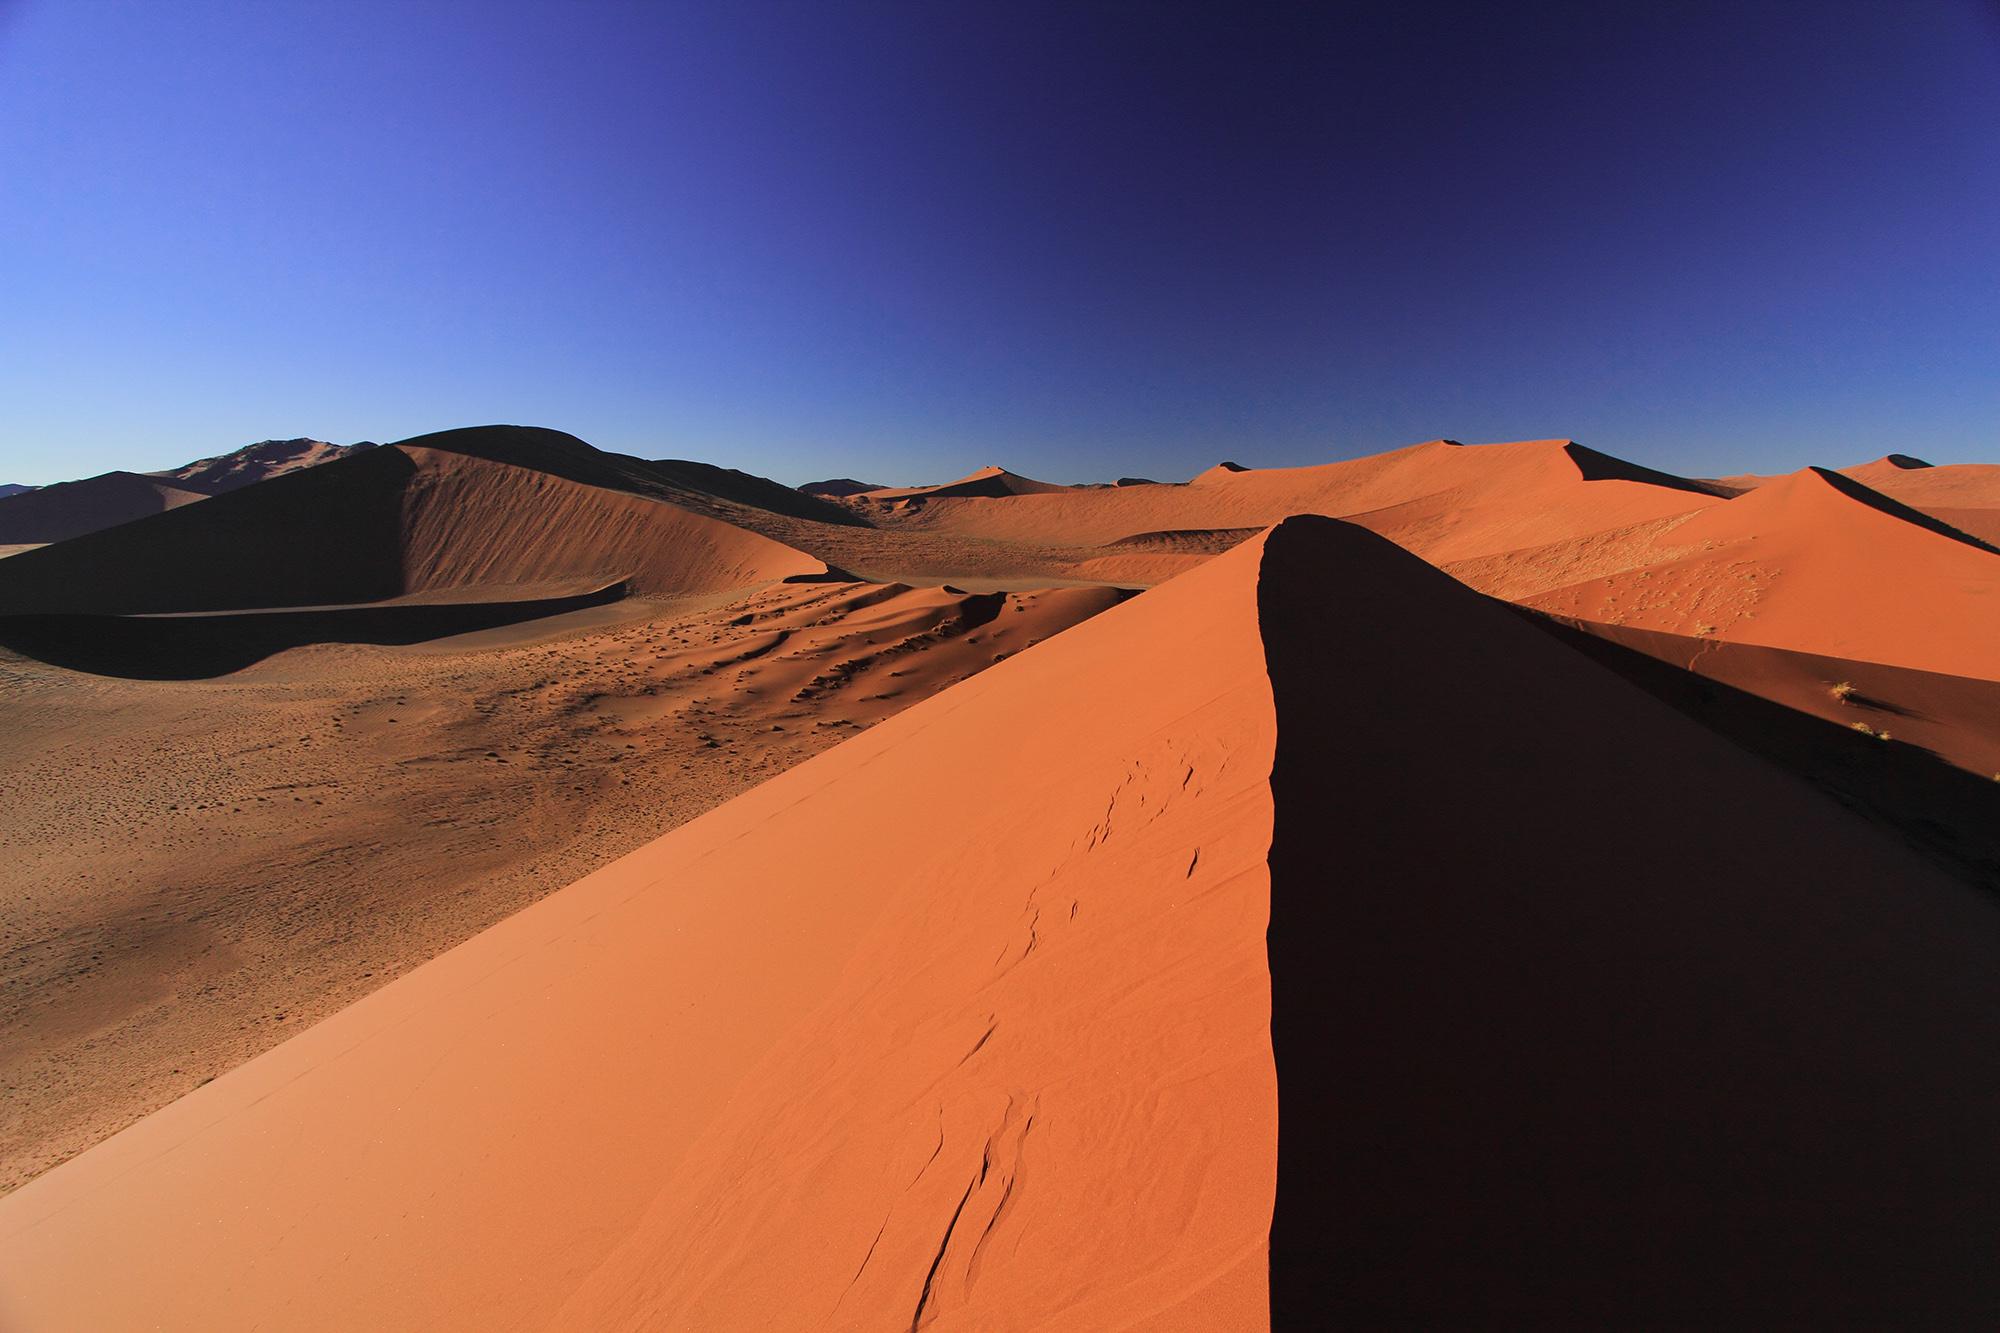 Dunes de Sossusvlei en Namibie par Guillaume Projetti